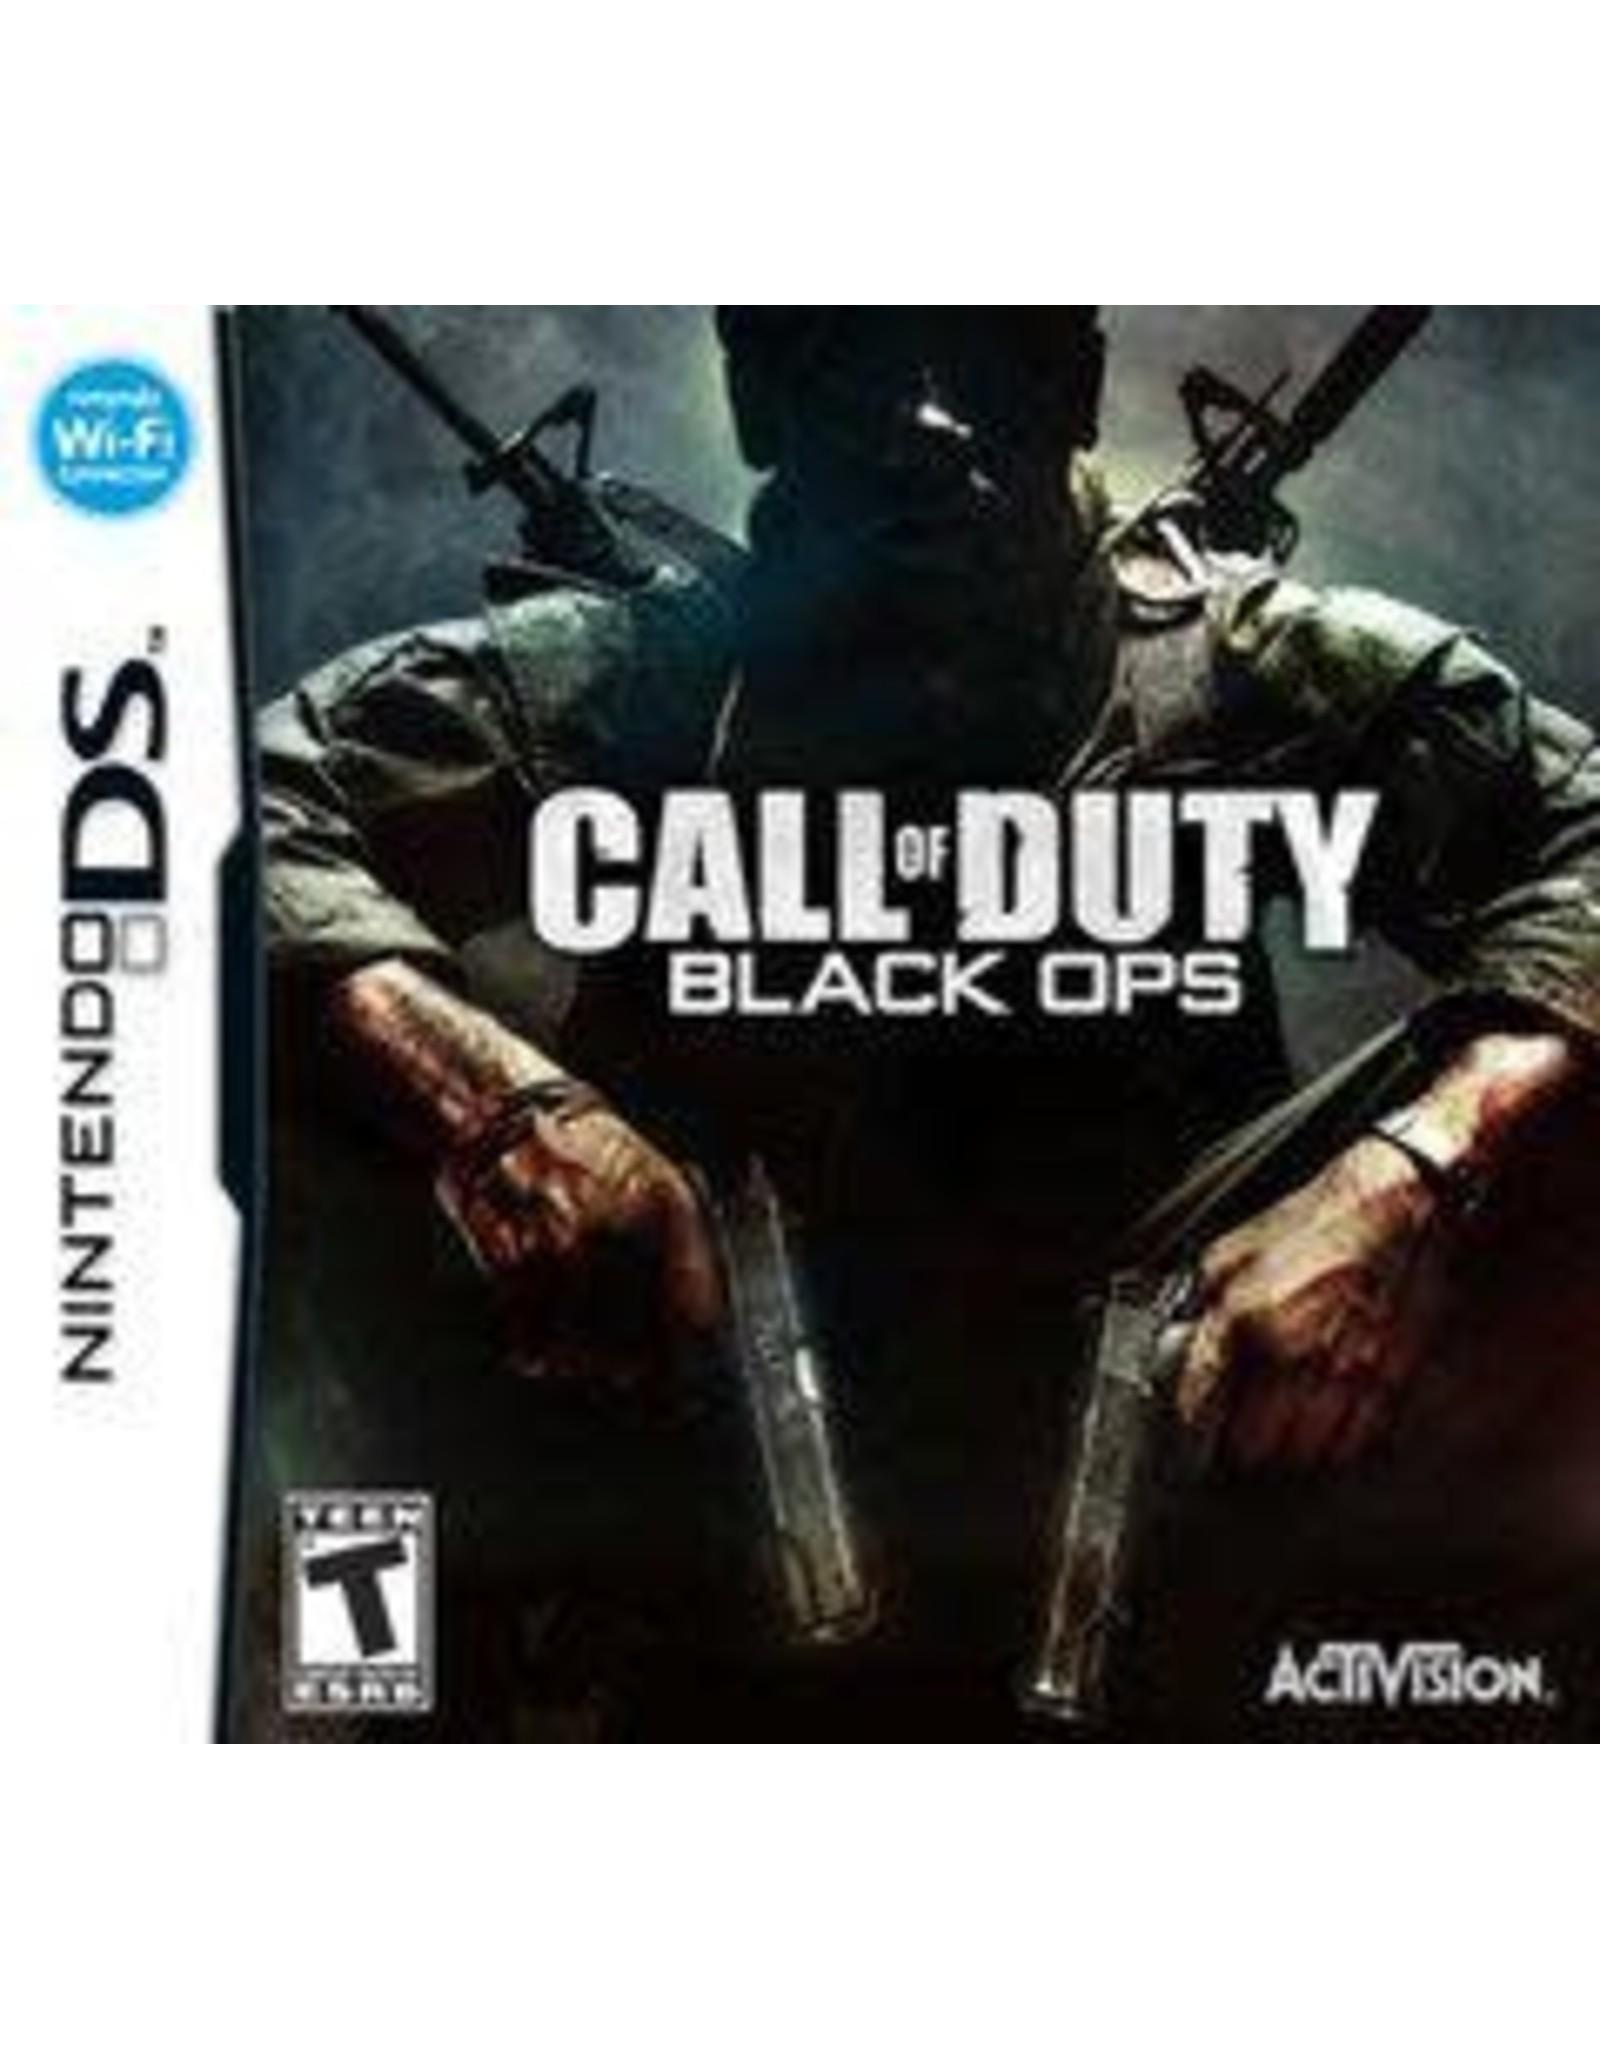 Nintendo DS Call of Duty Black Ops (CiB)